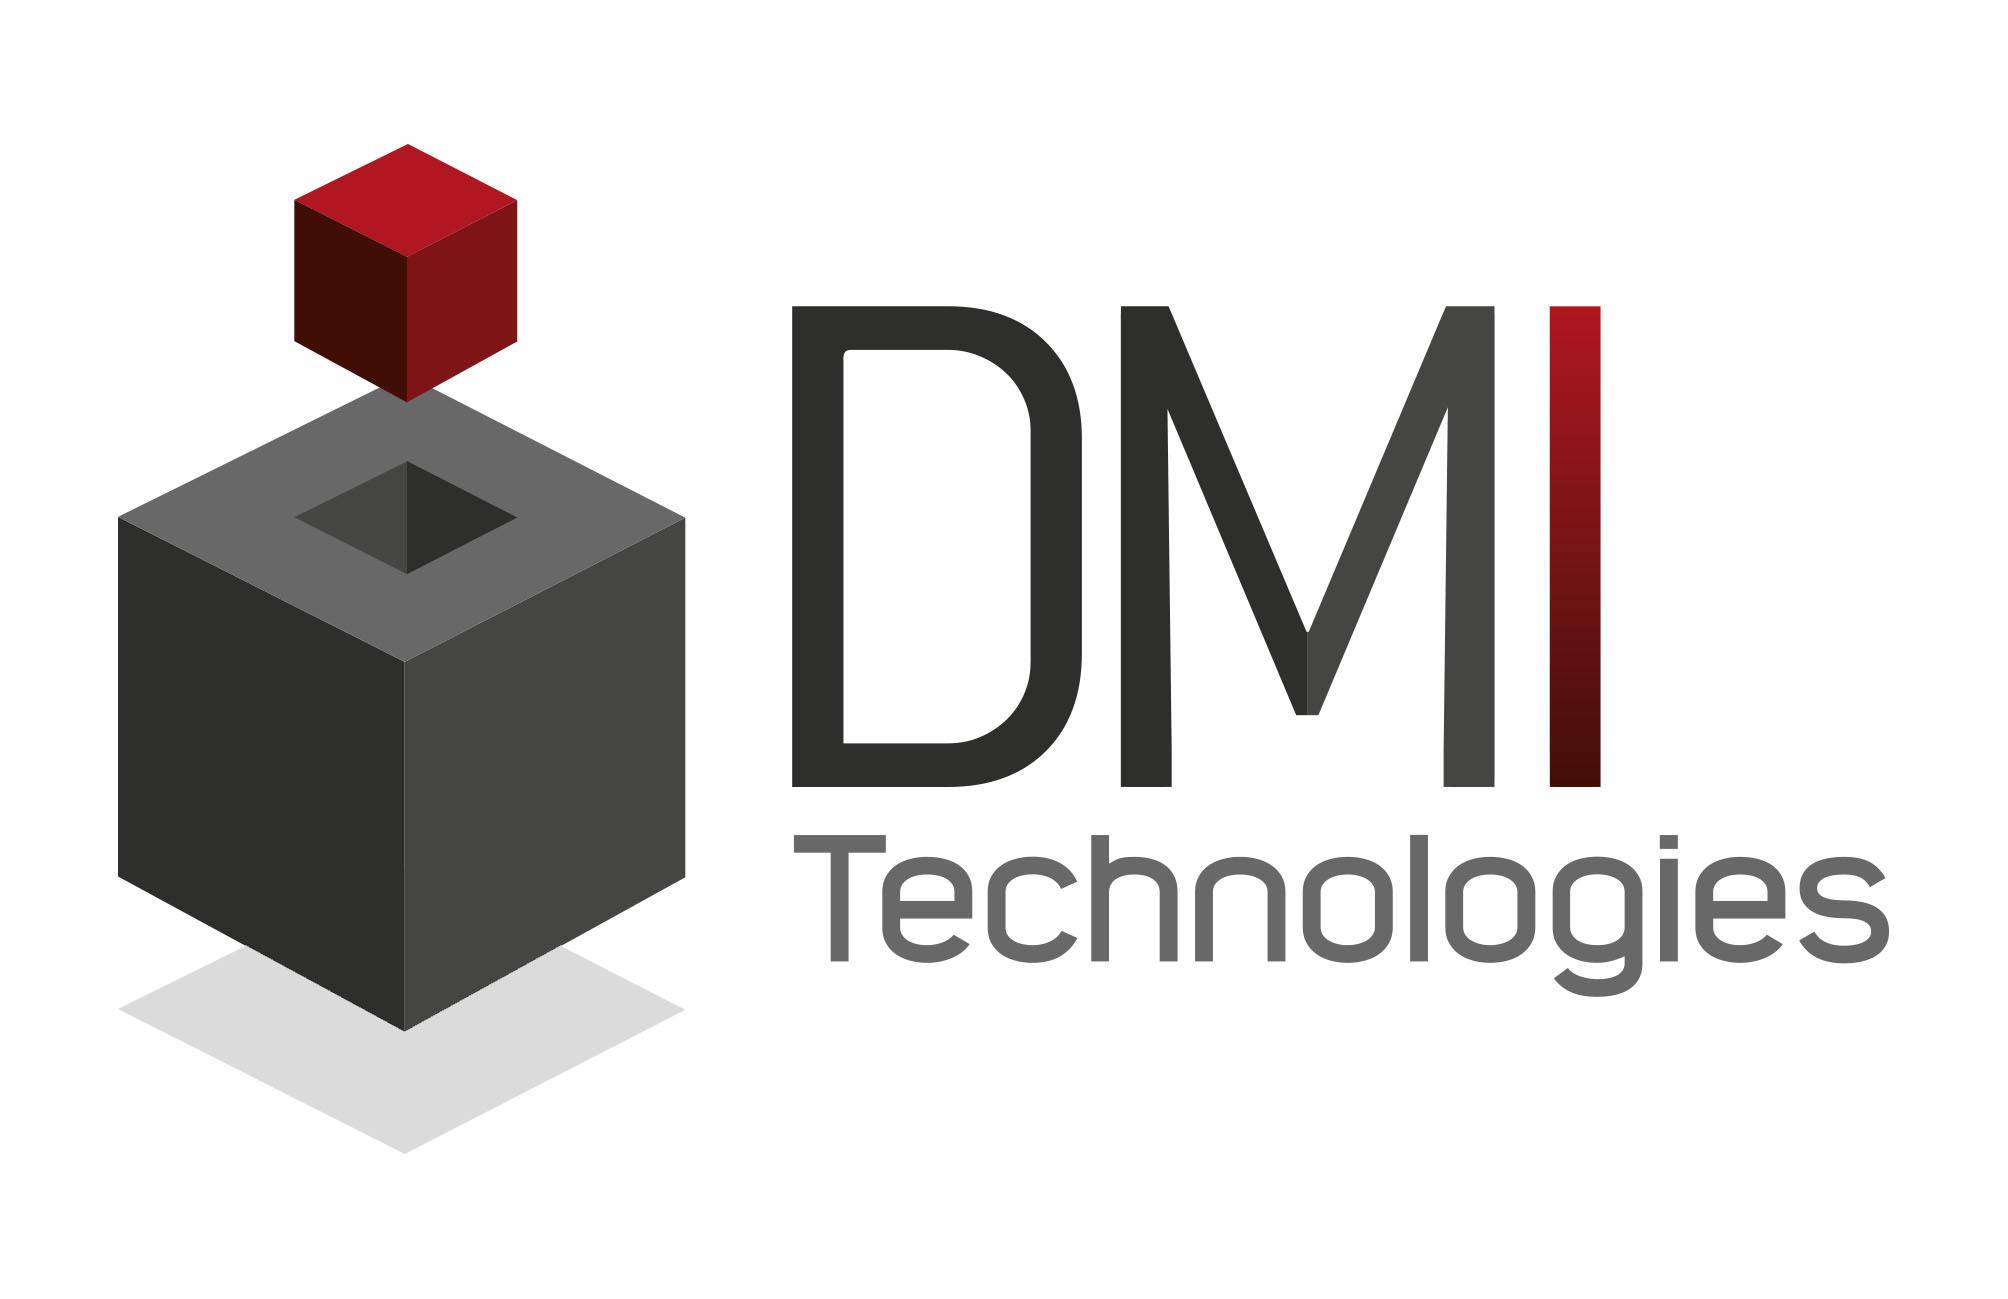 DMI TECHNOLOGIES